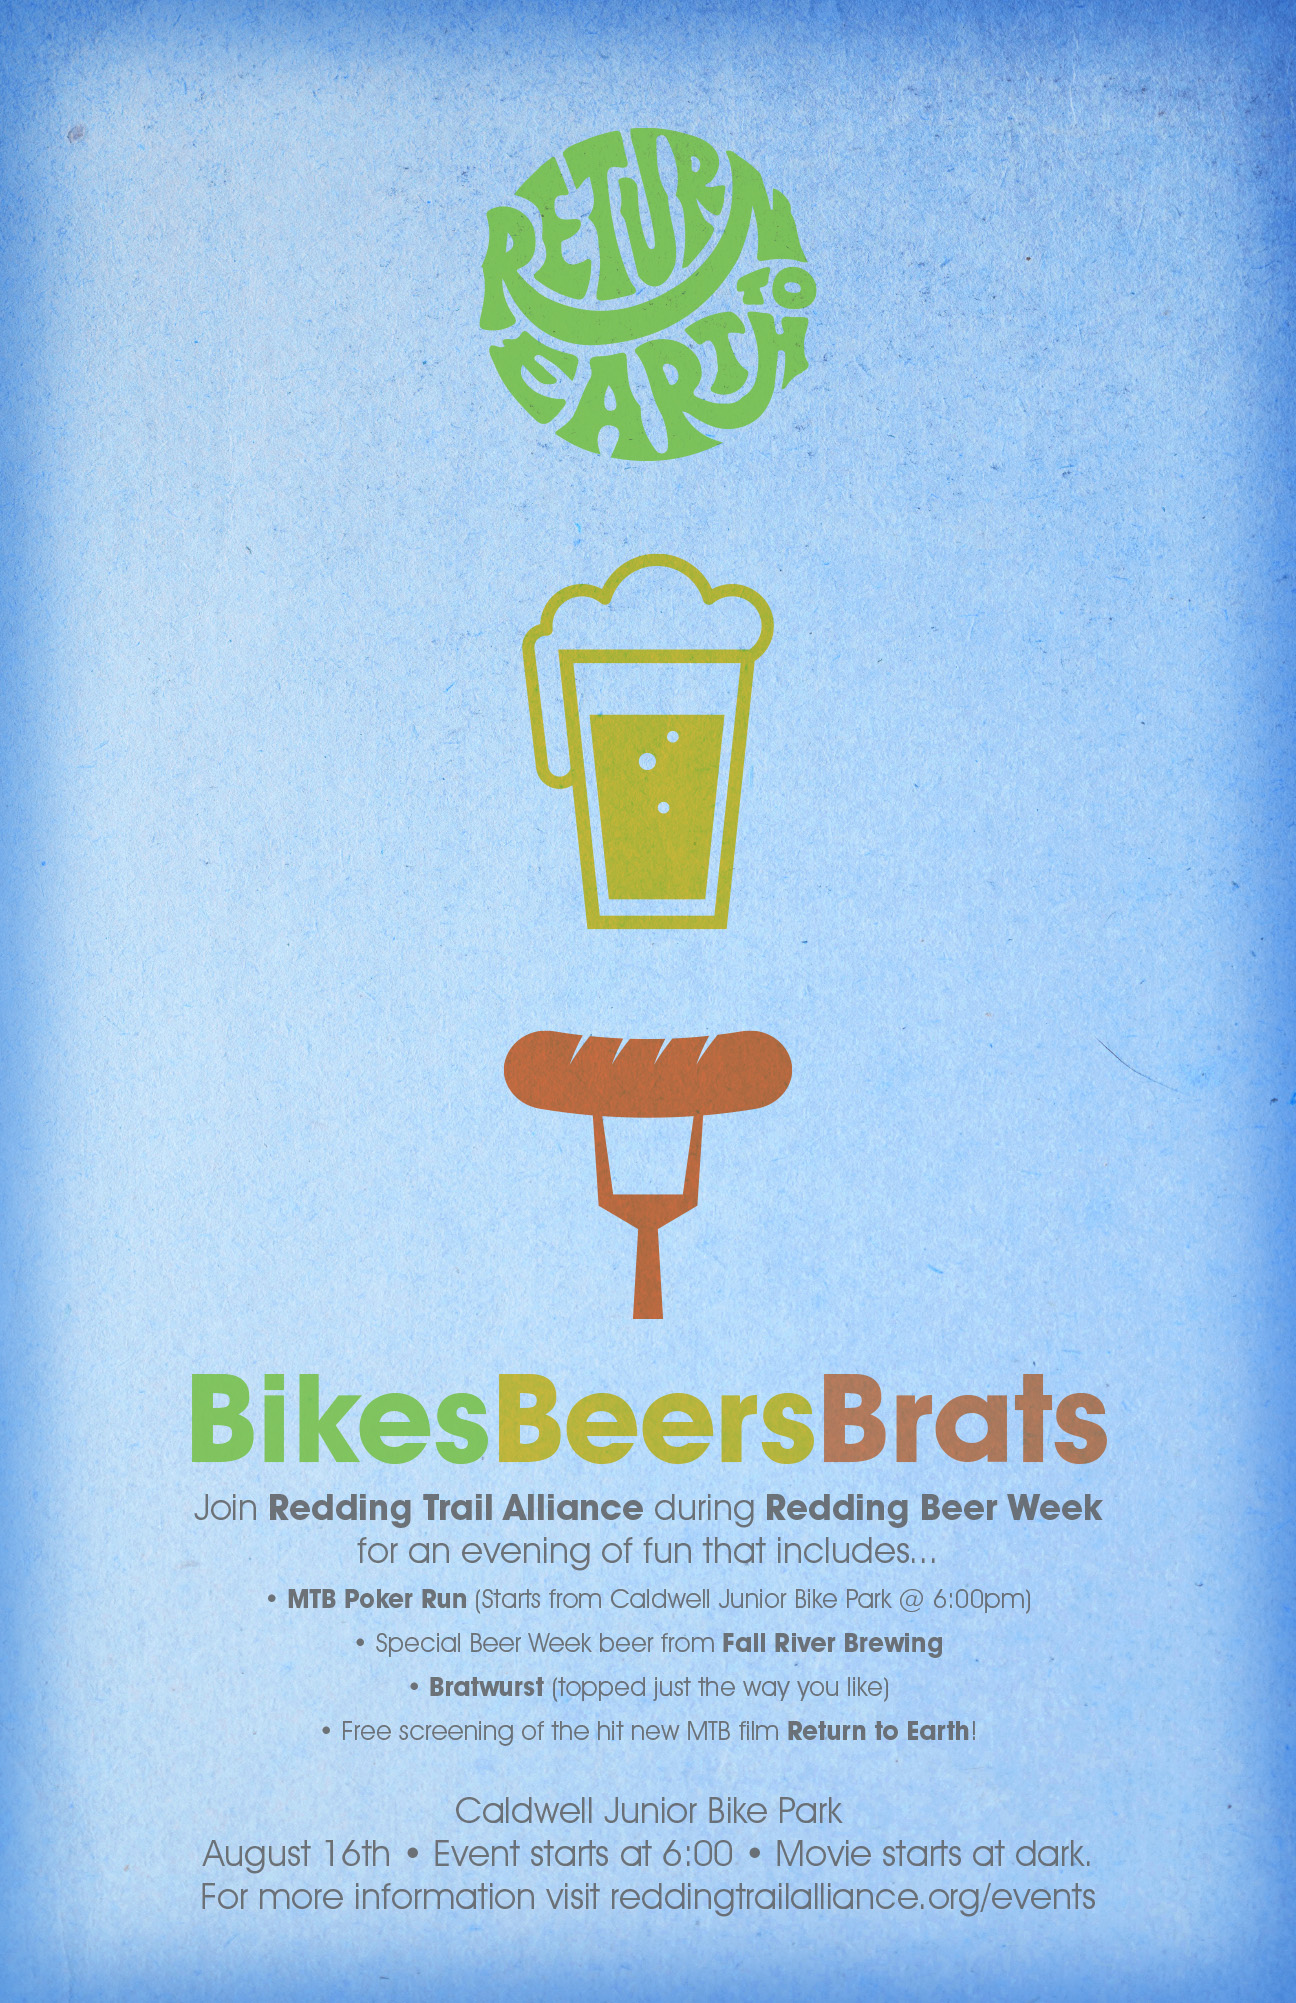 Beers Brats & Bikes.jpg